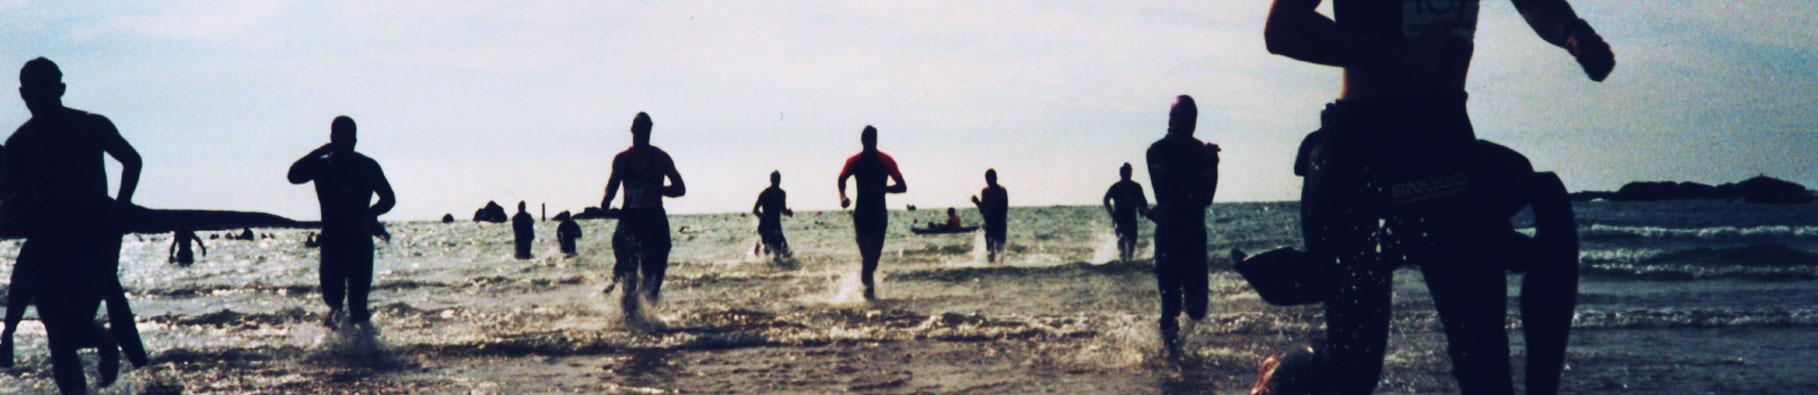 Triathlon event by Shoreline in Bude, Cornwall